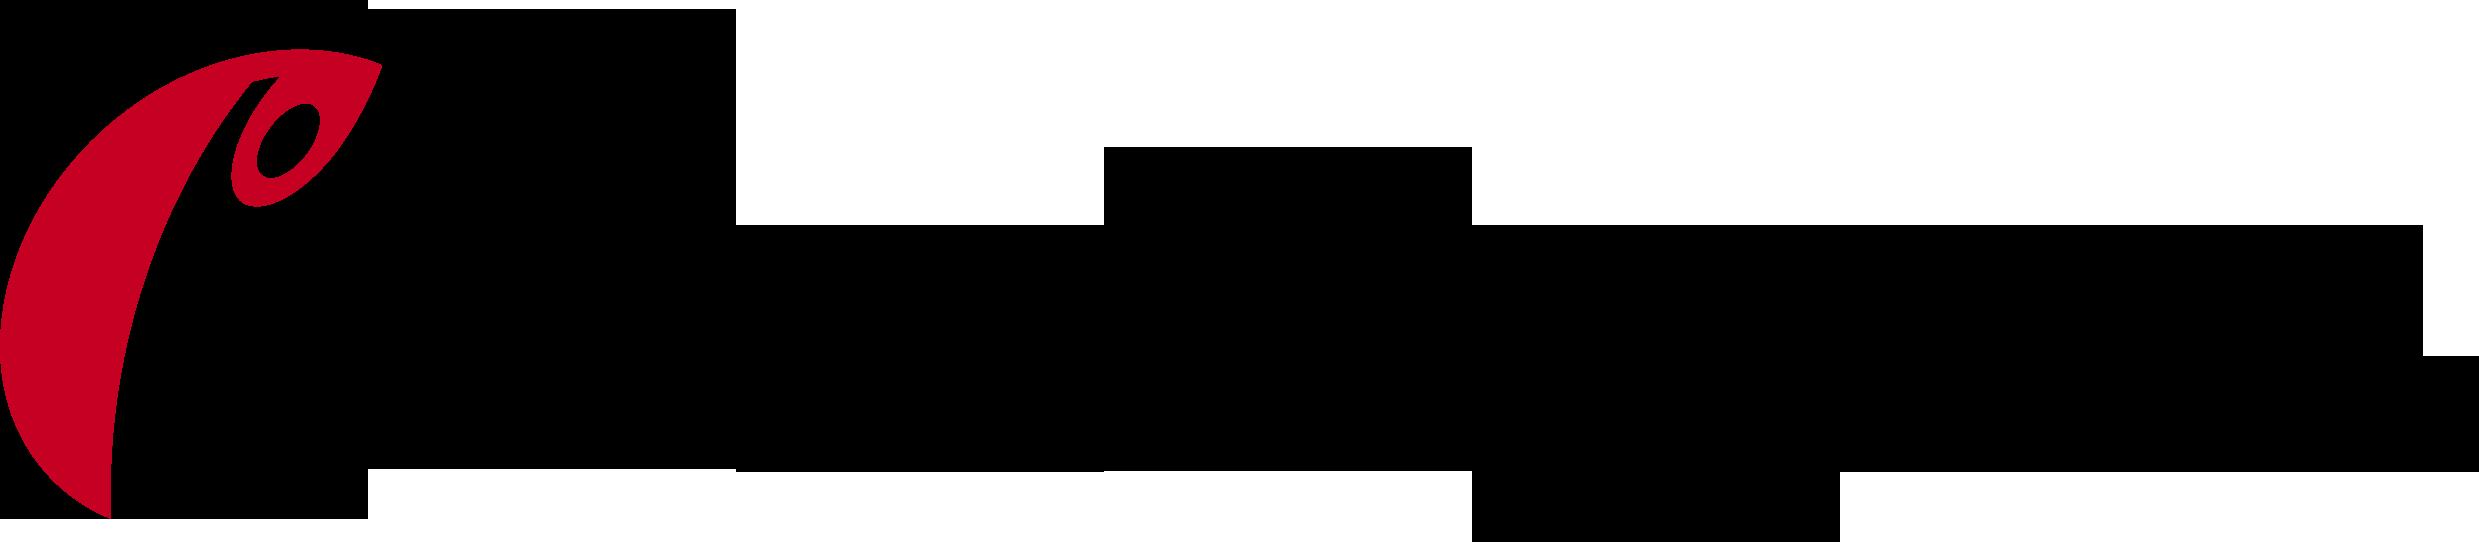 rackspace_logo-CLR